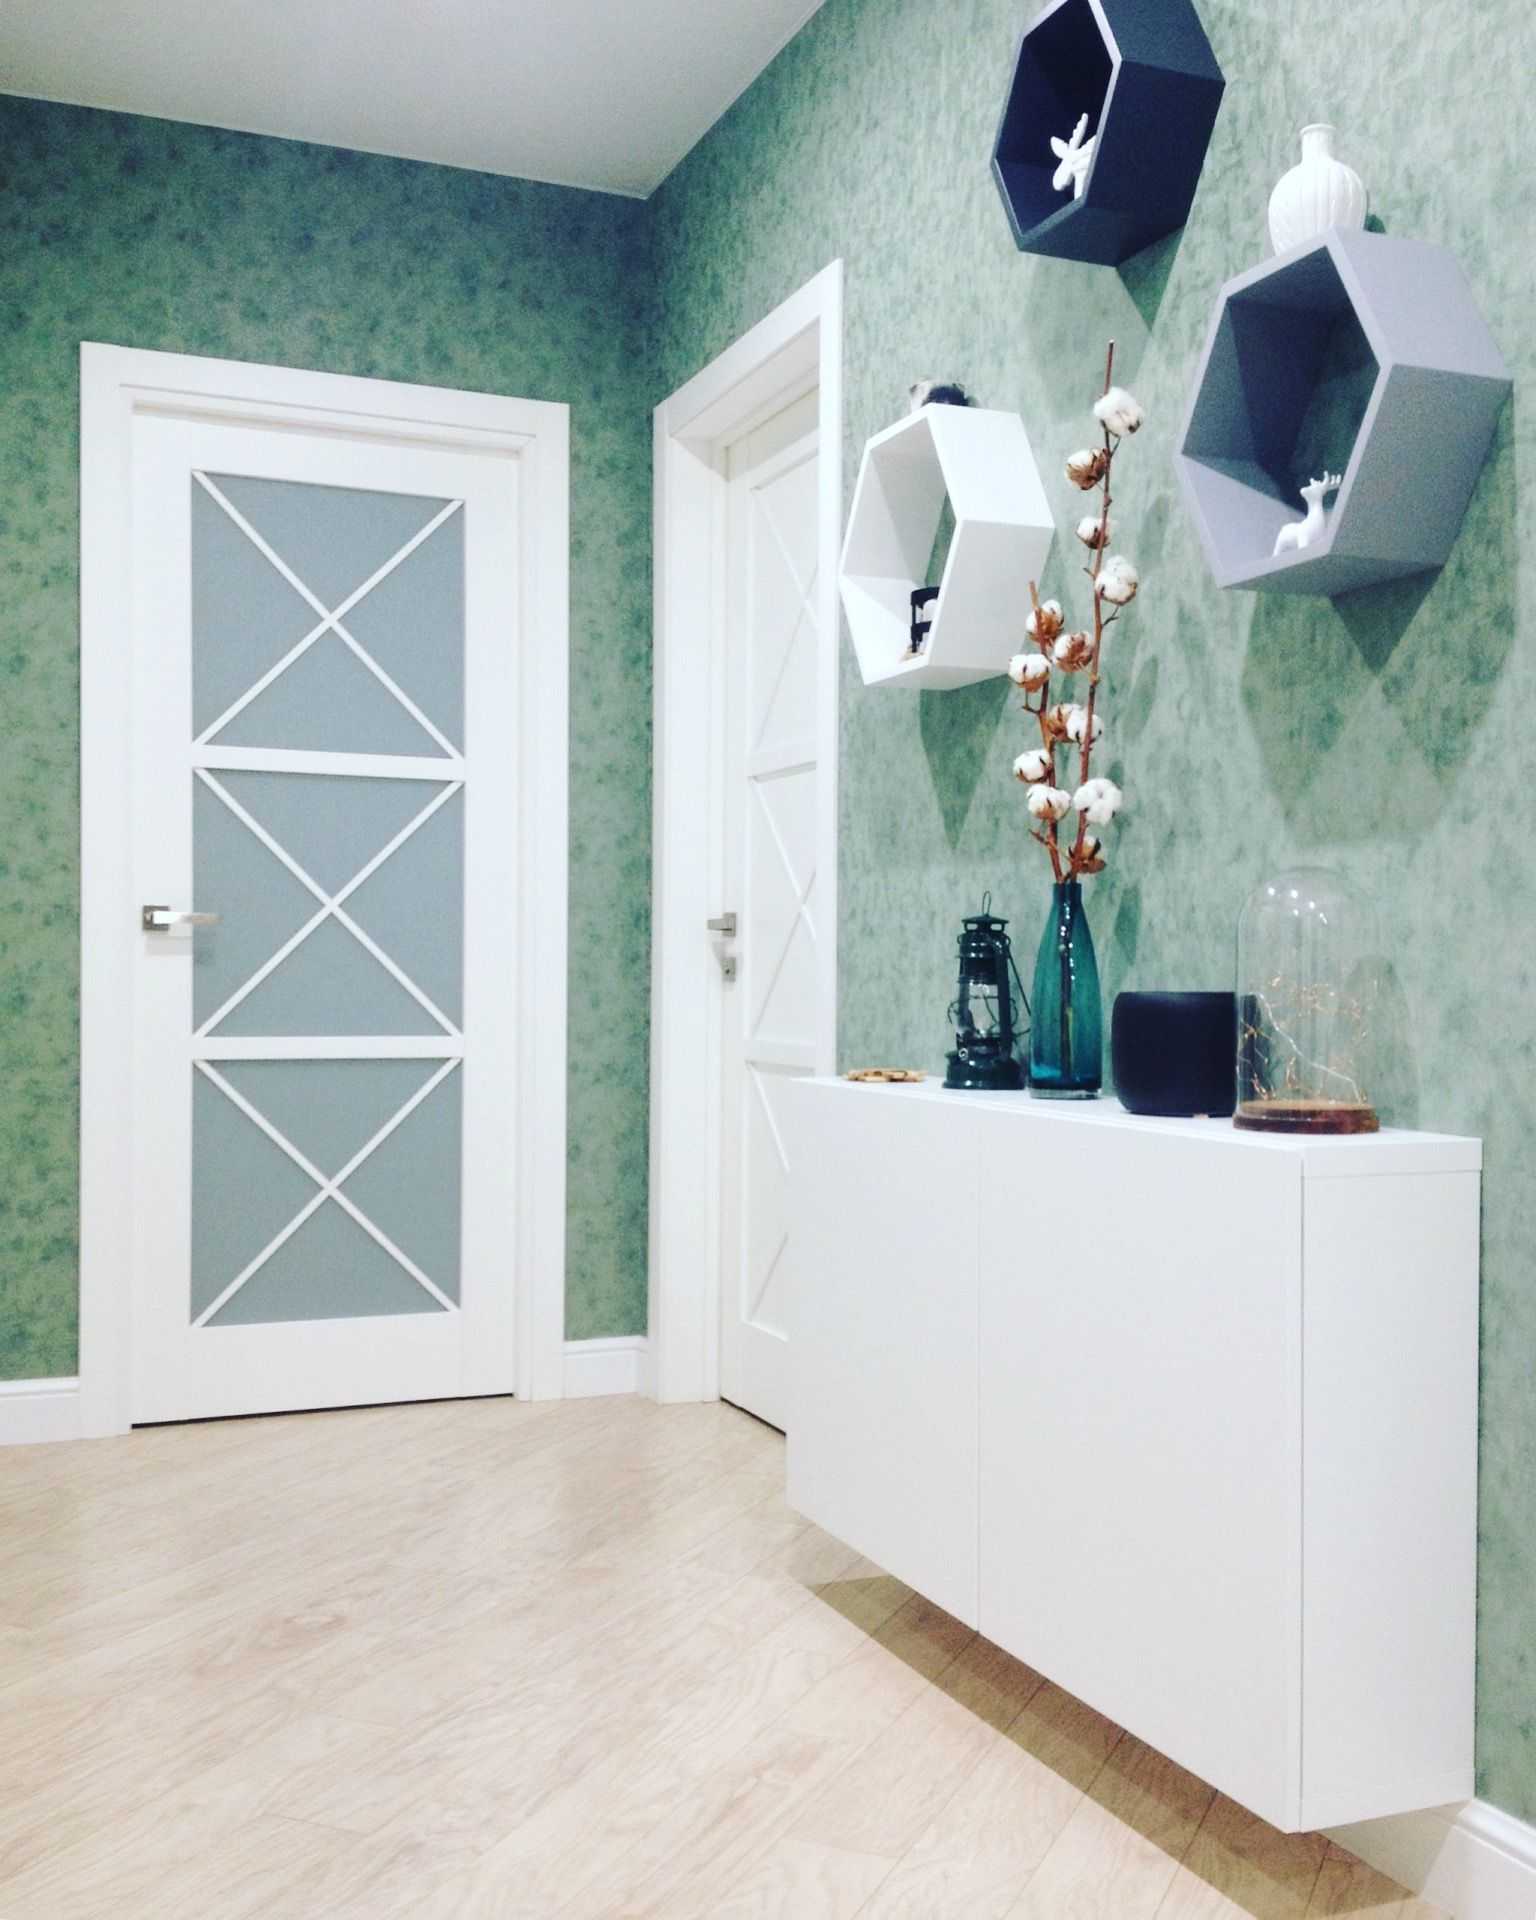 Bathroom Vanity Jysk honeycomb shelves jysk | home | pinterest | shelves